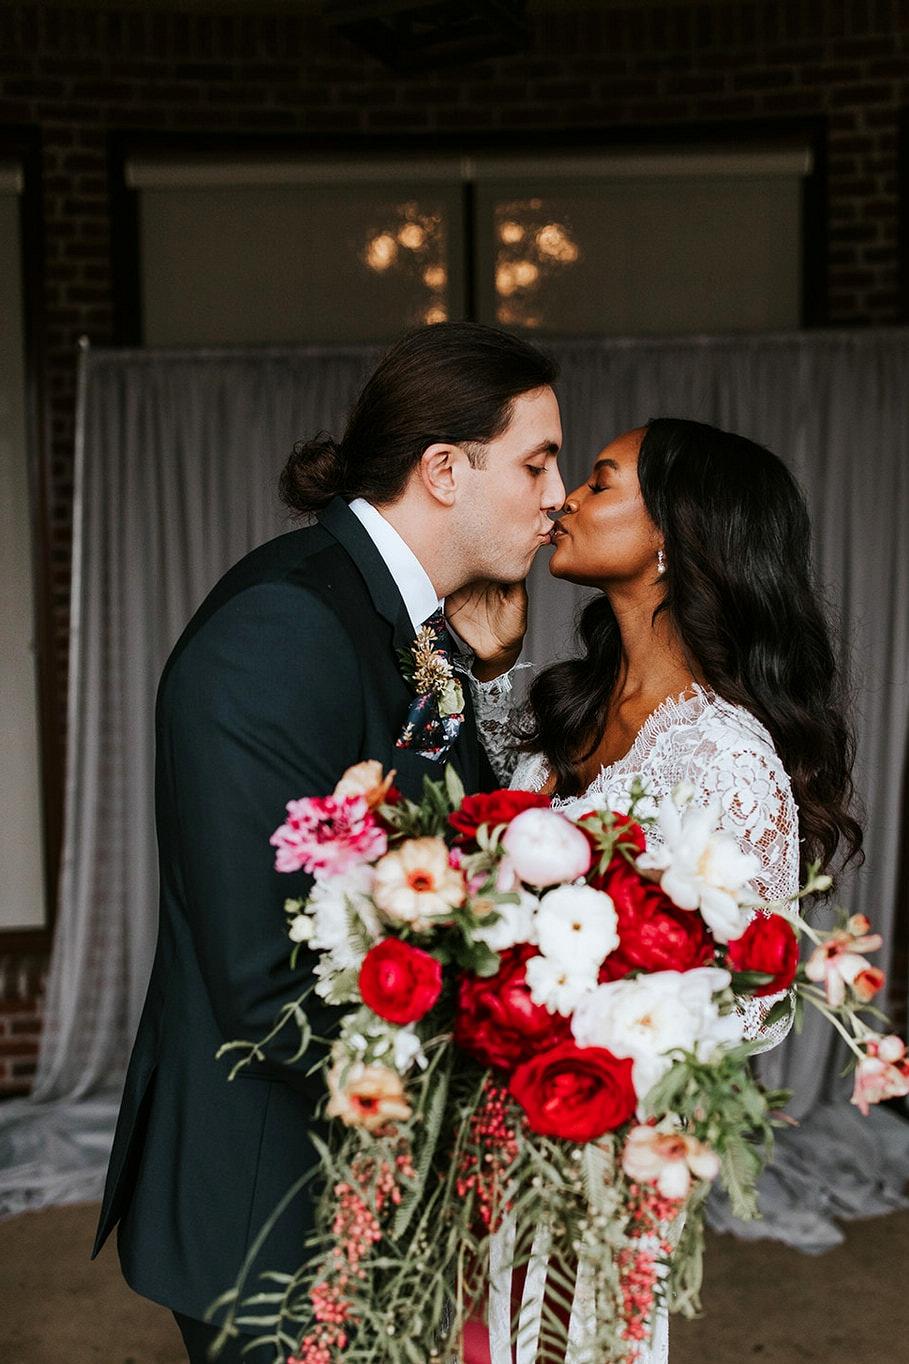 Boho Atlanta Wedding in Pops of Crimson Red and Teal ⋆ Ruffled